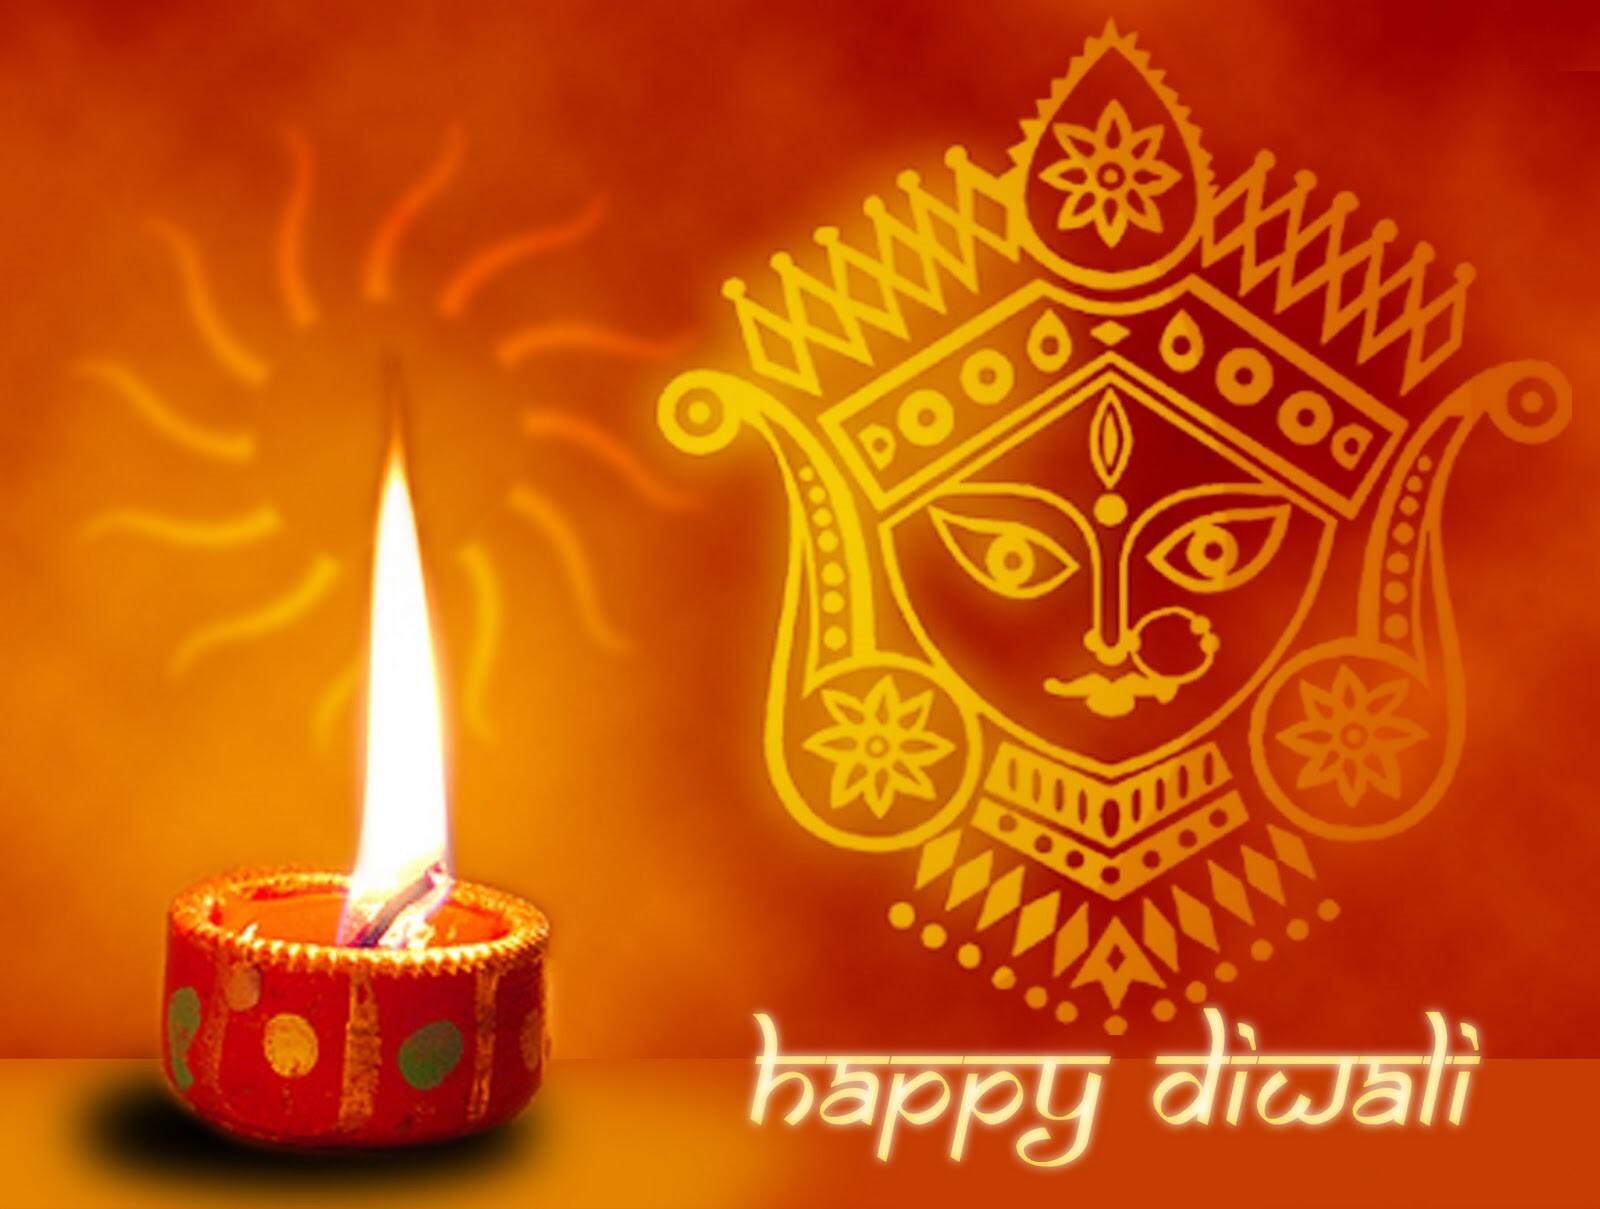 Diwali greetings festivals celebrations greetingcards hd wallpapers diwali greetings festivals celebrations greetingcards download m4hsunfo